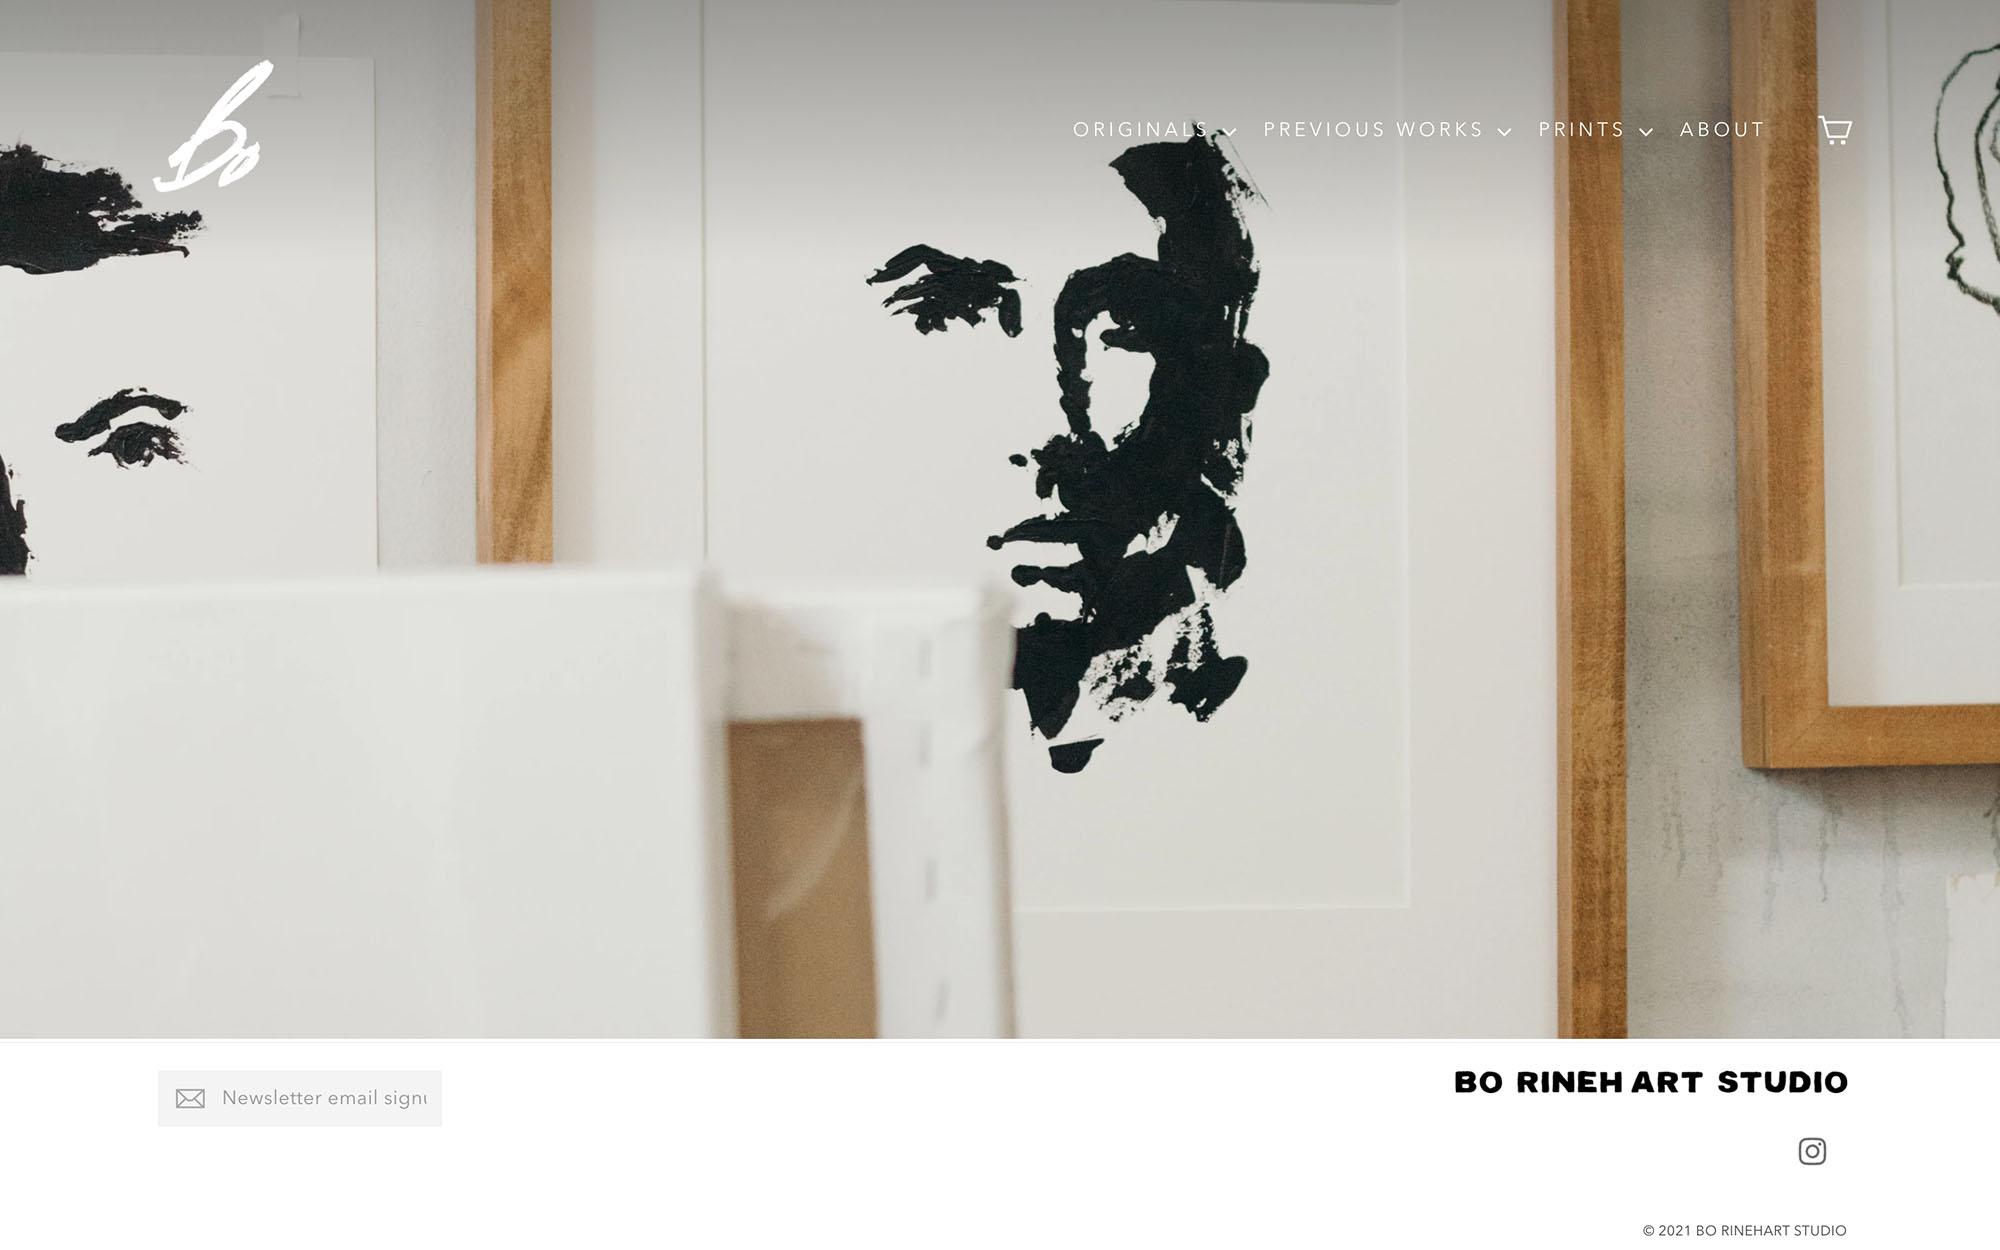 Bo Rinehart Studio